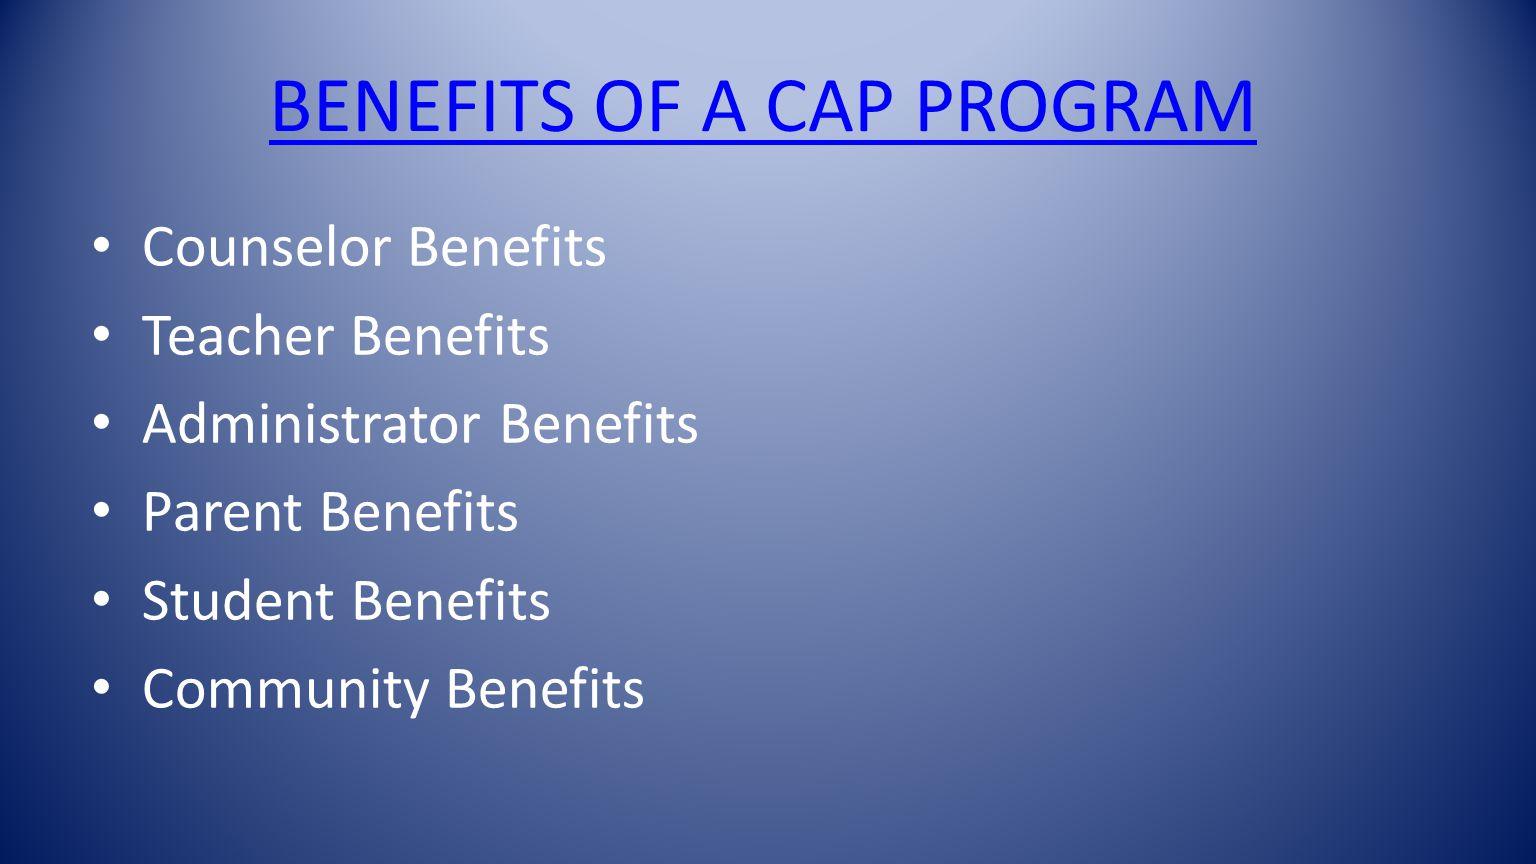 BENEFITS OF A CAP PROGRAM Counselor Benefits Teacher Benefits Administrator Benefits Parent Benefits Student Benefits Community Benefits